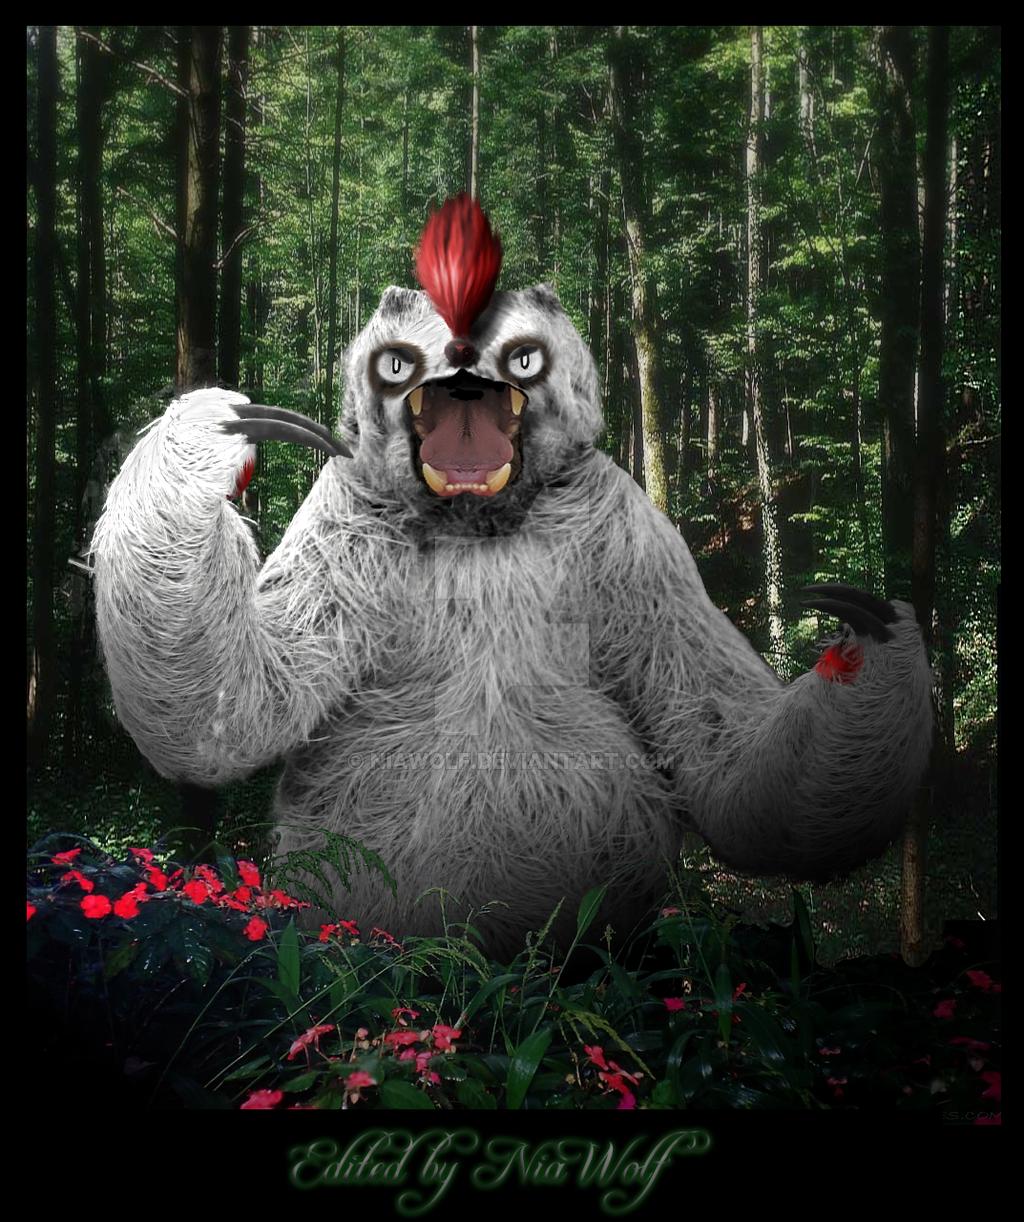 Vigoroth, the Sloth by NiaWolf on DeviantArt